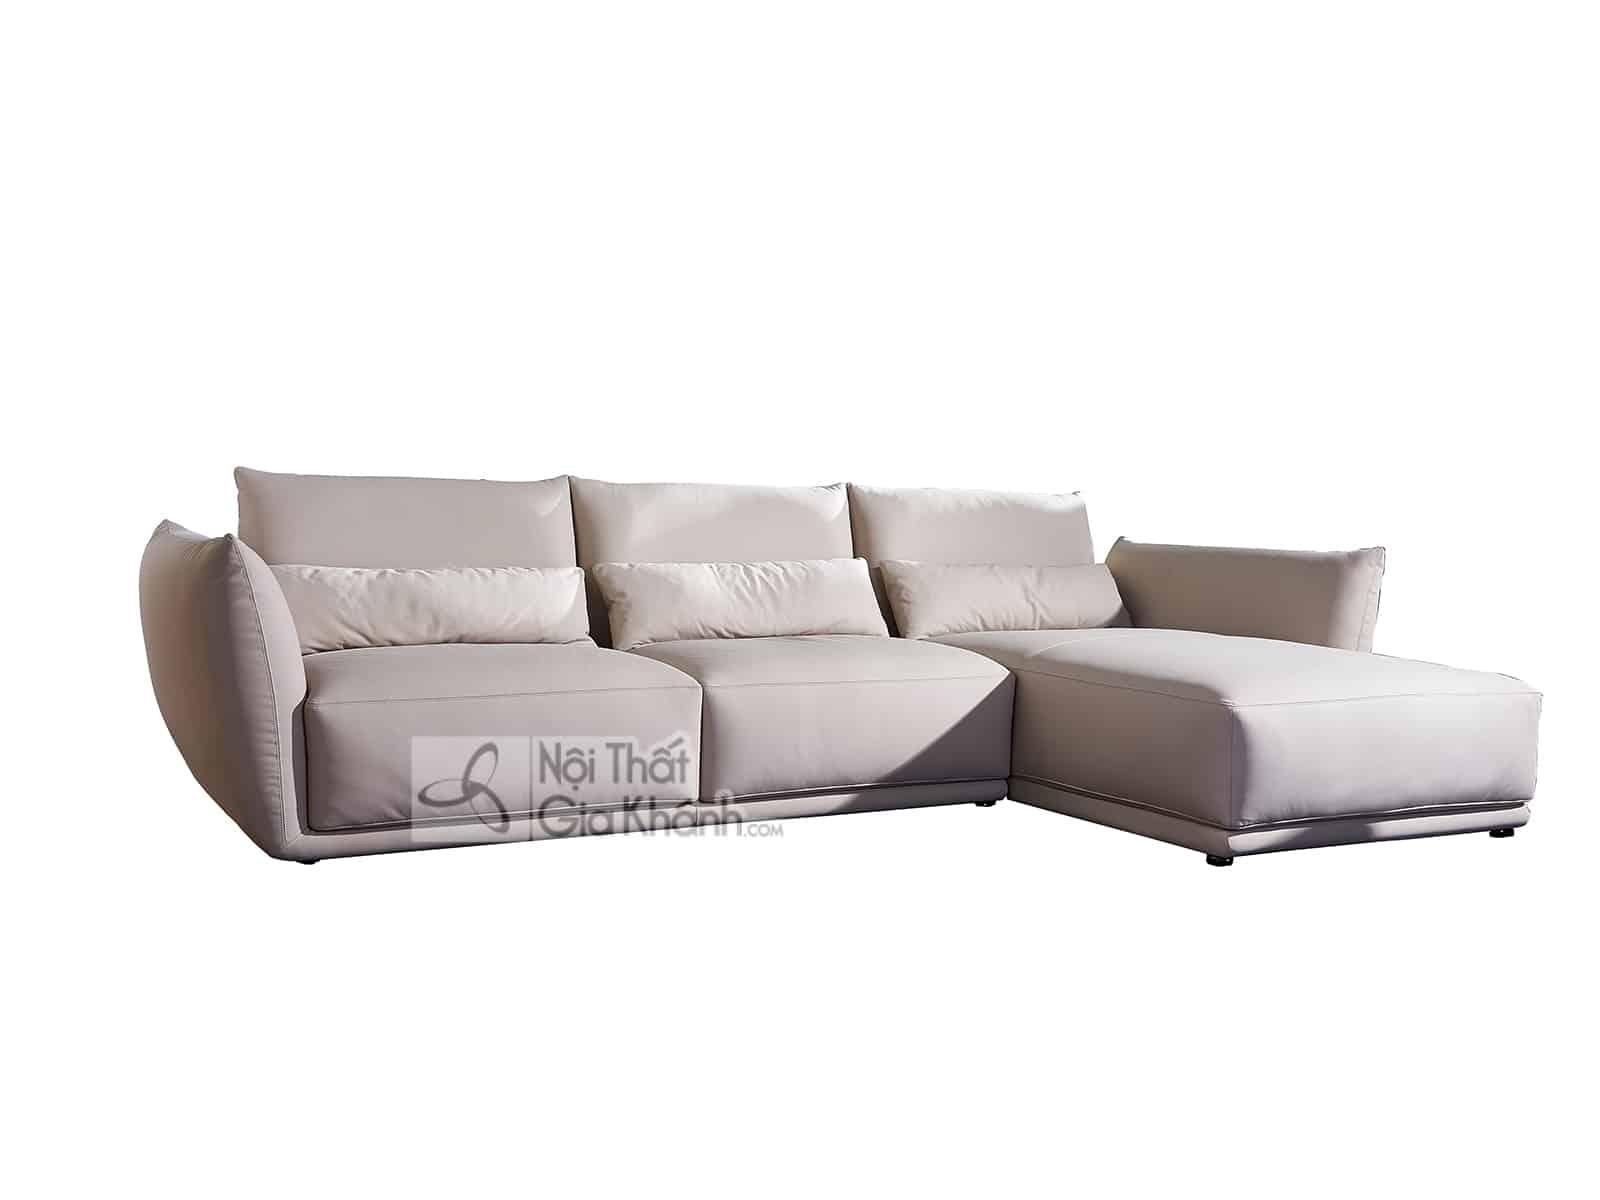 bo sofa da goc trai 2 bang nhap khau mbk1909sf 13 - Sofa đẹp phong cách ý nhập khẩu ST1909T50-2